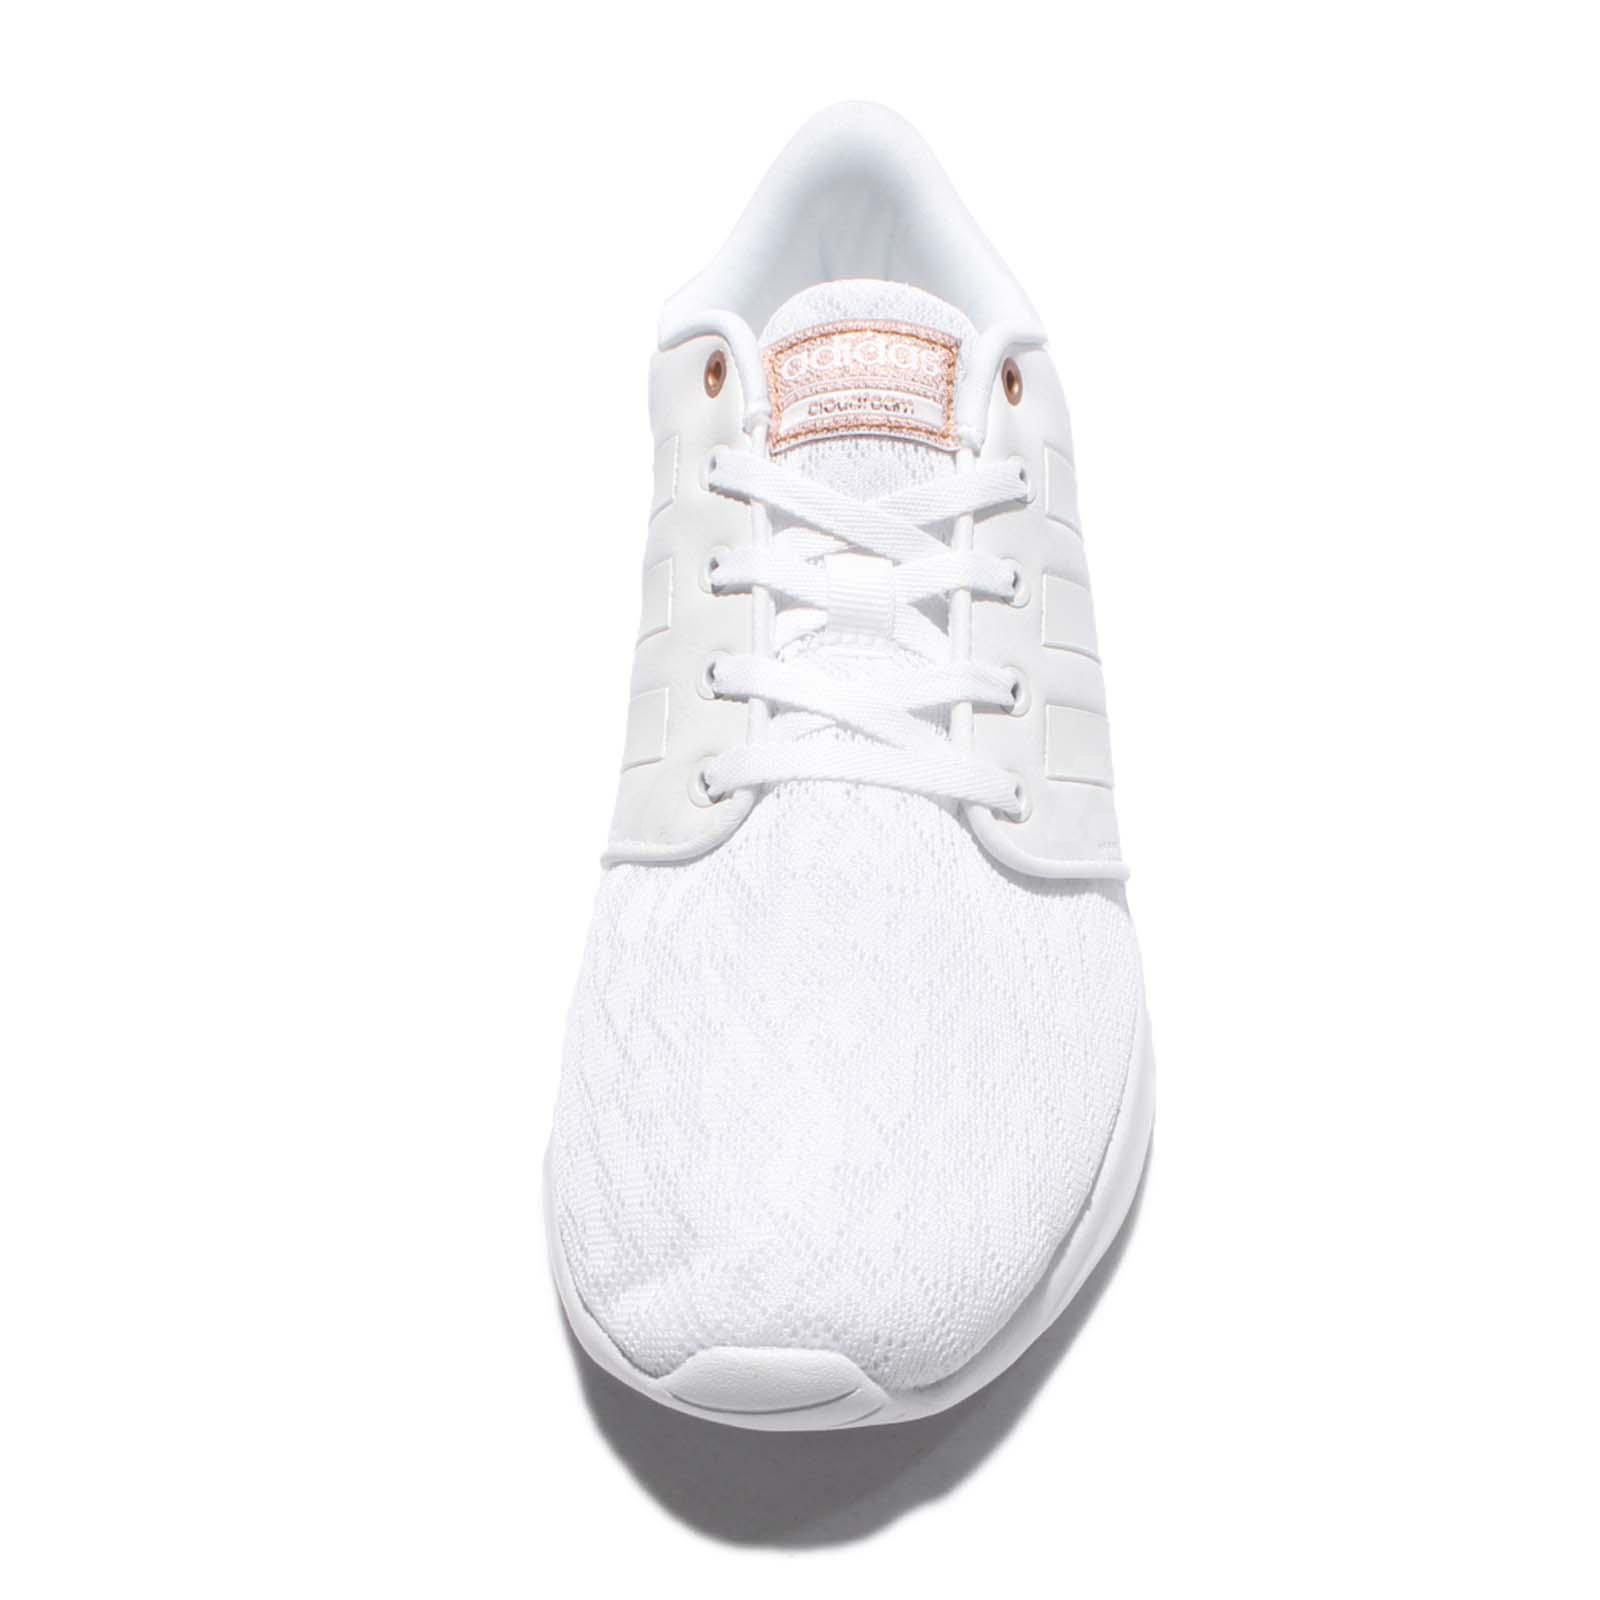 cdbfb4978885c Khaki Adidas Ultra Boost 1.0 Online Ewing 2 Chainz